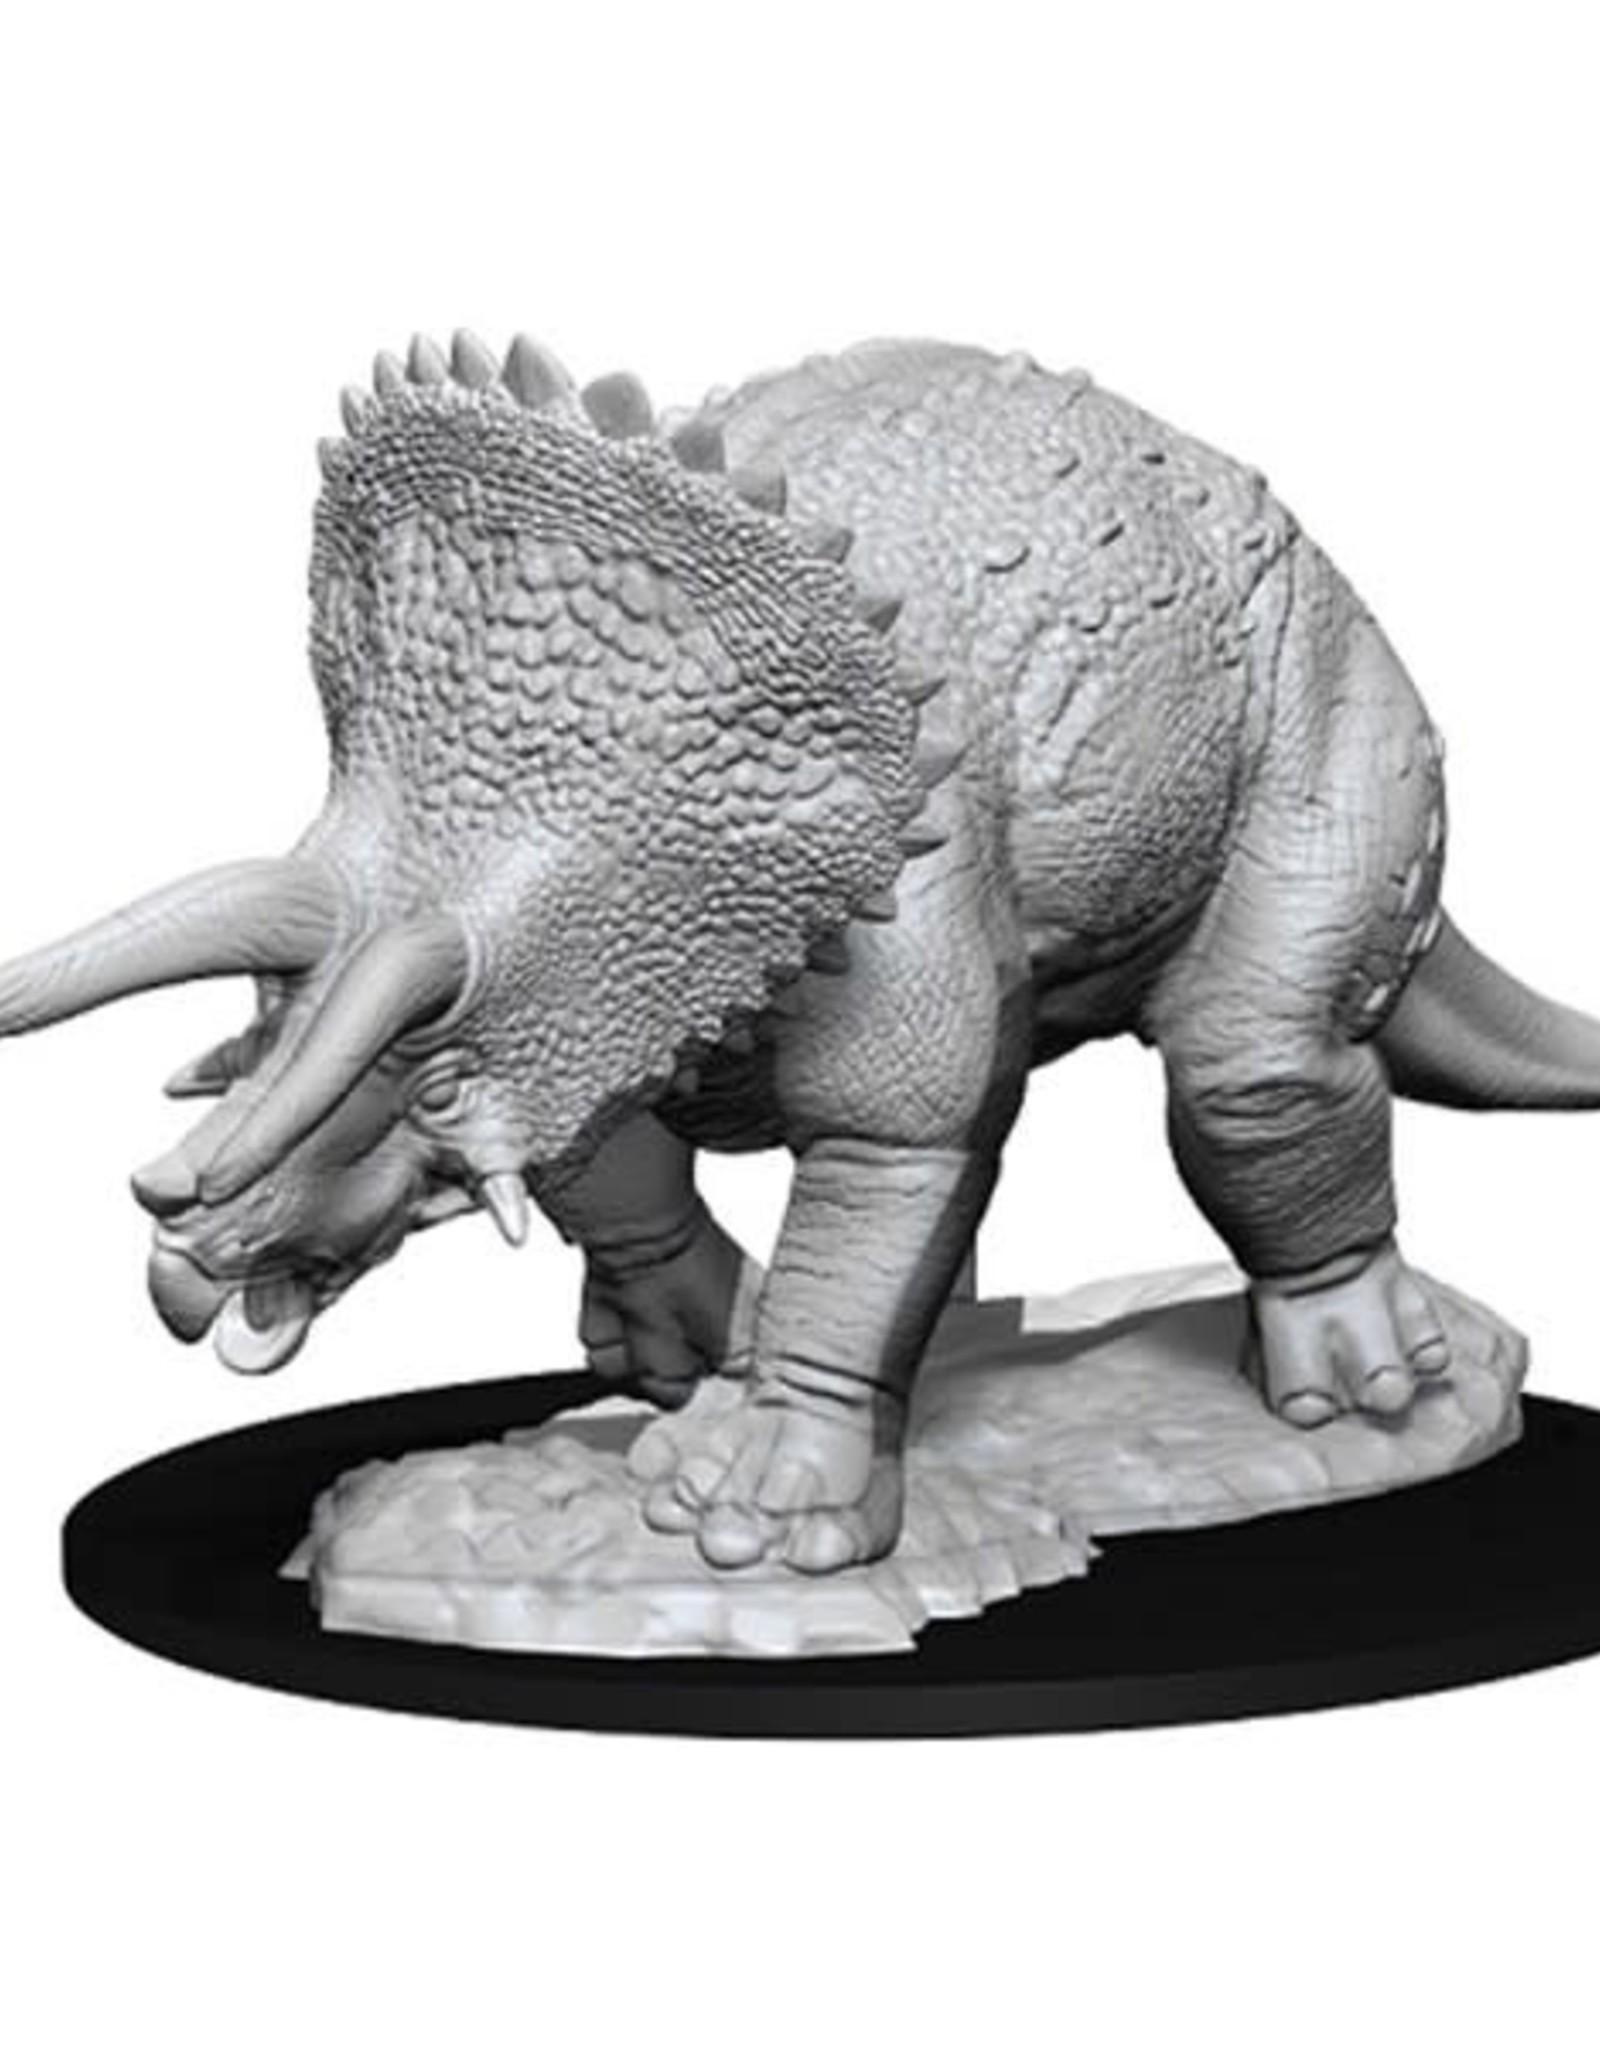 WizKids Dungeons & Dragons Nolzur's Marvelous Miniatures: Triceratops